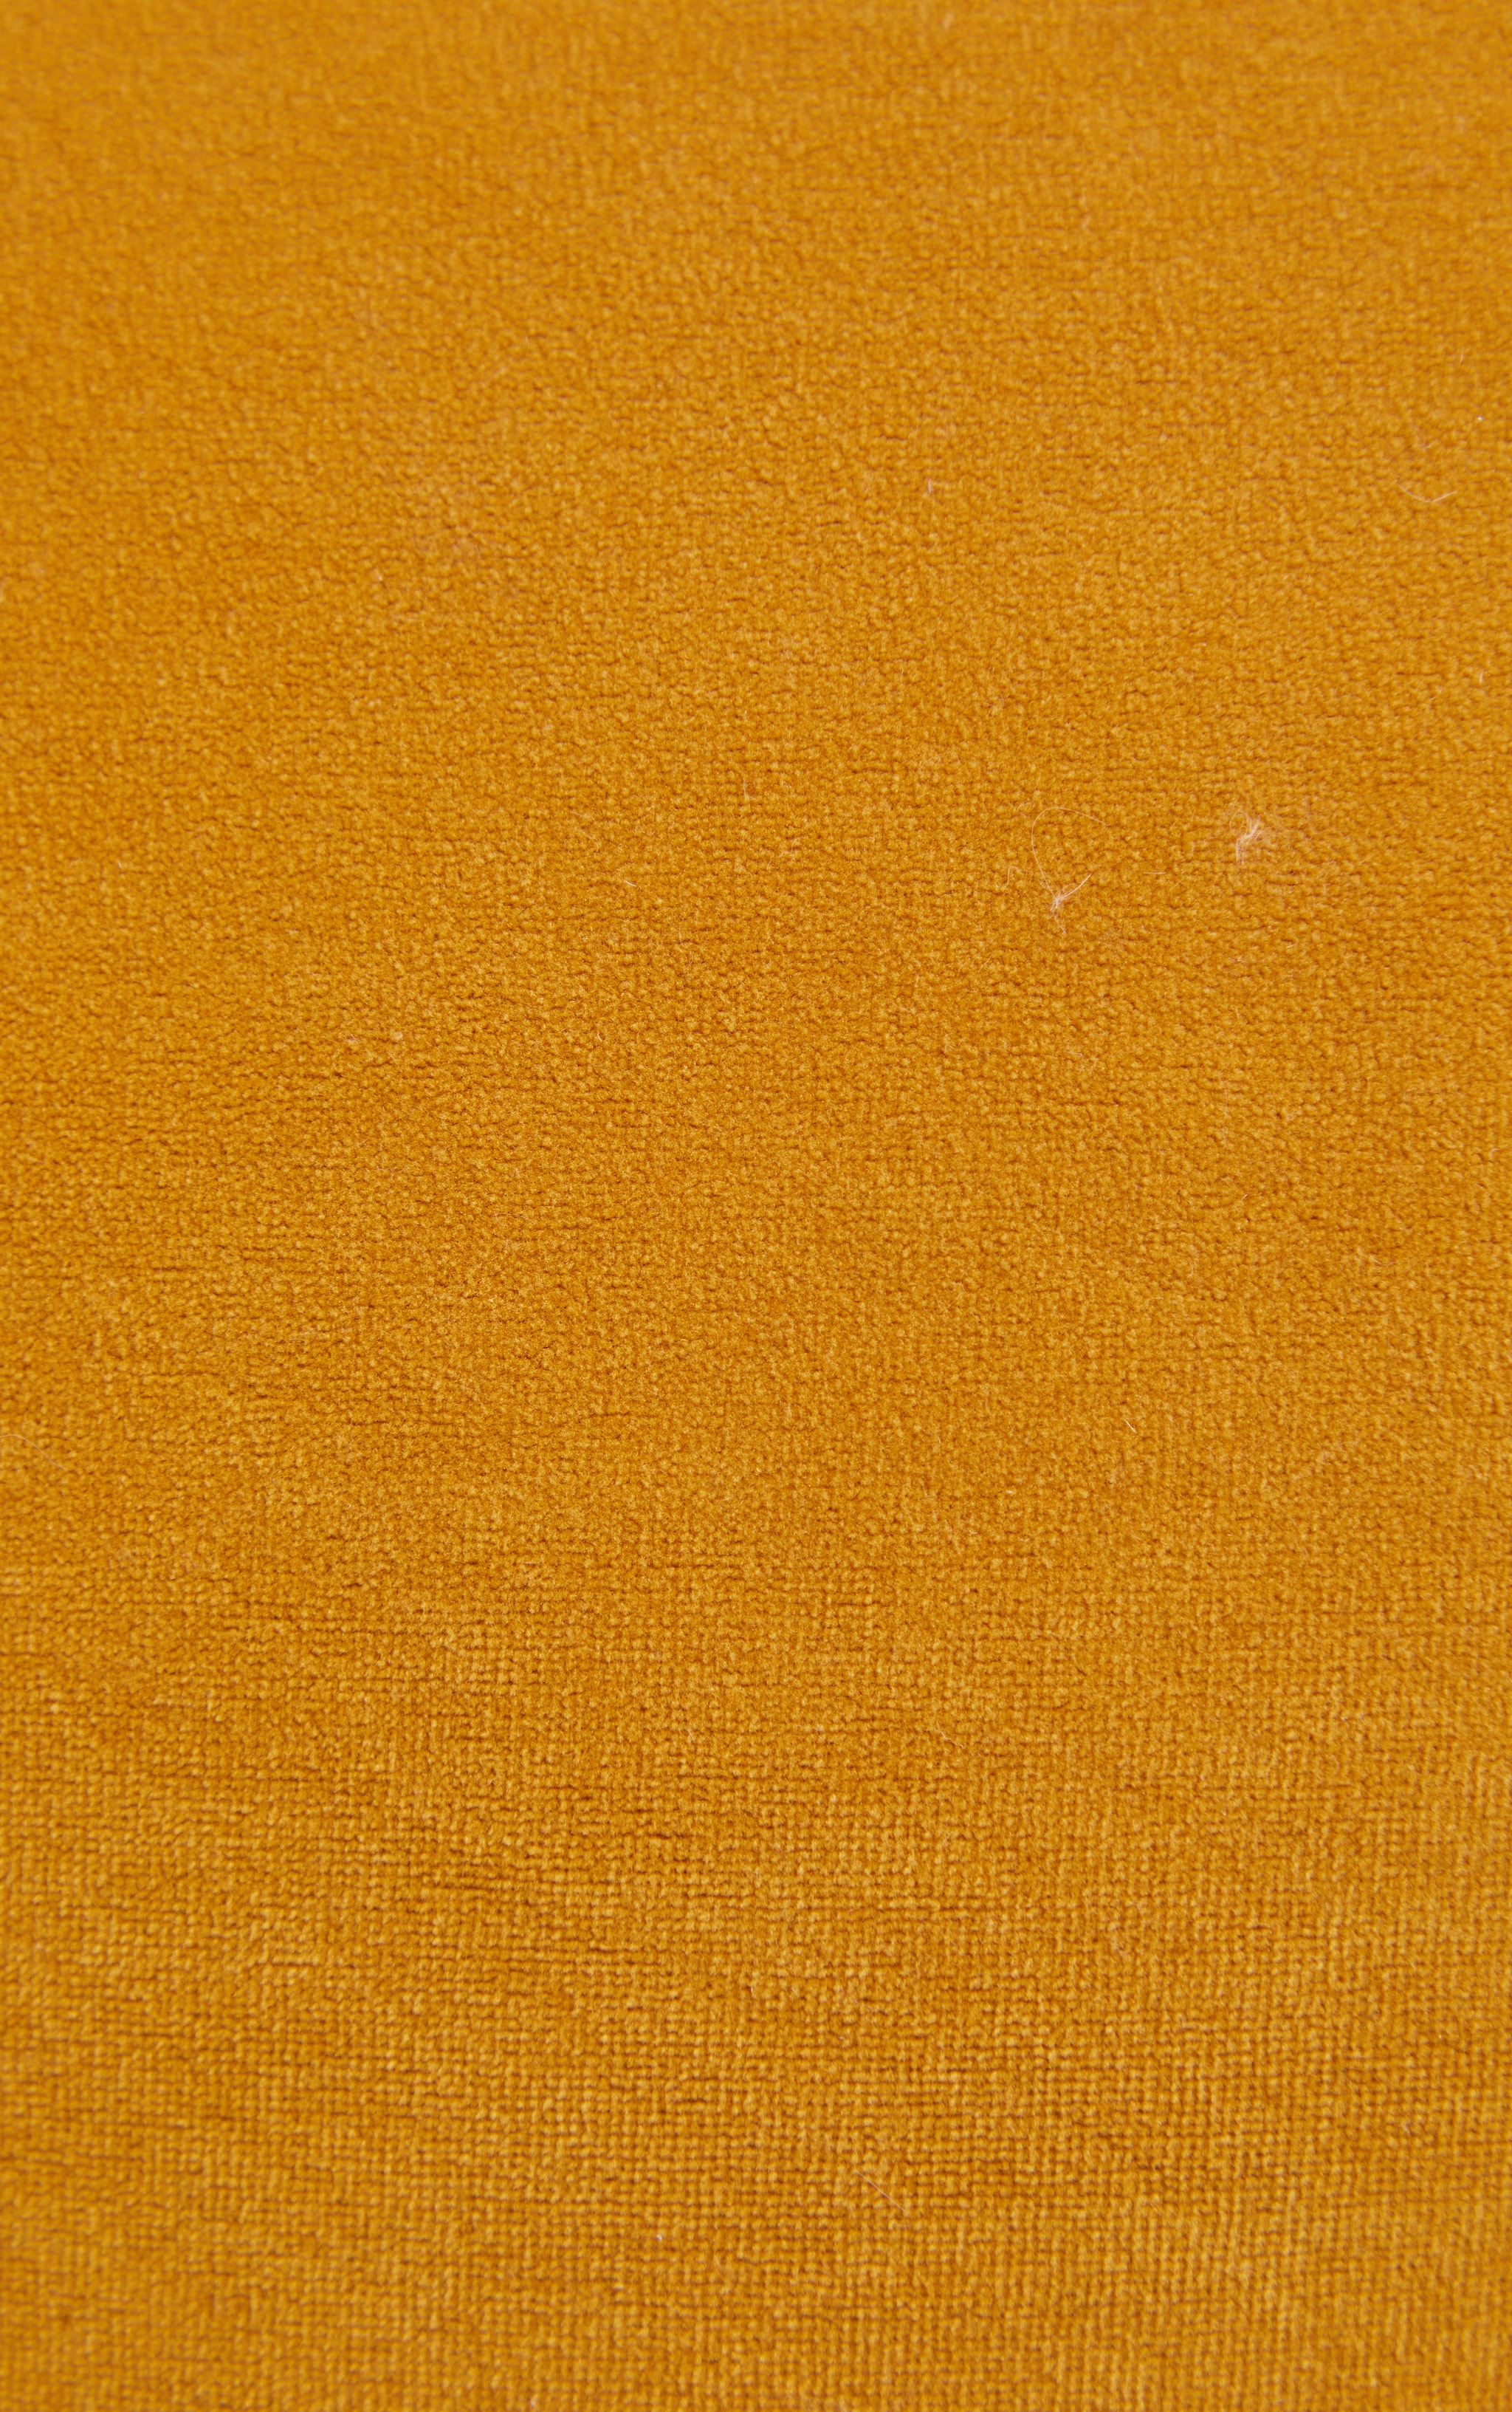 Yellow Velvet Cushion 4